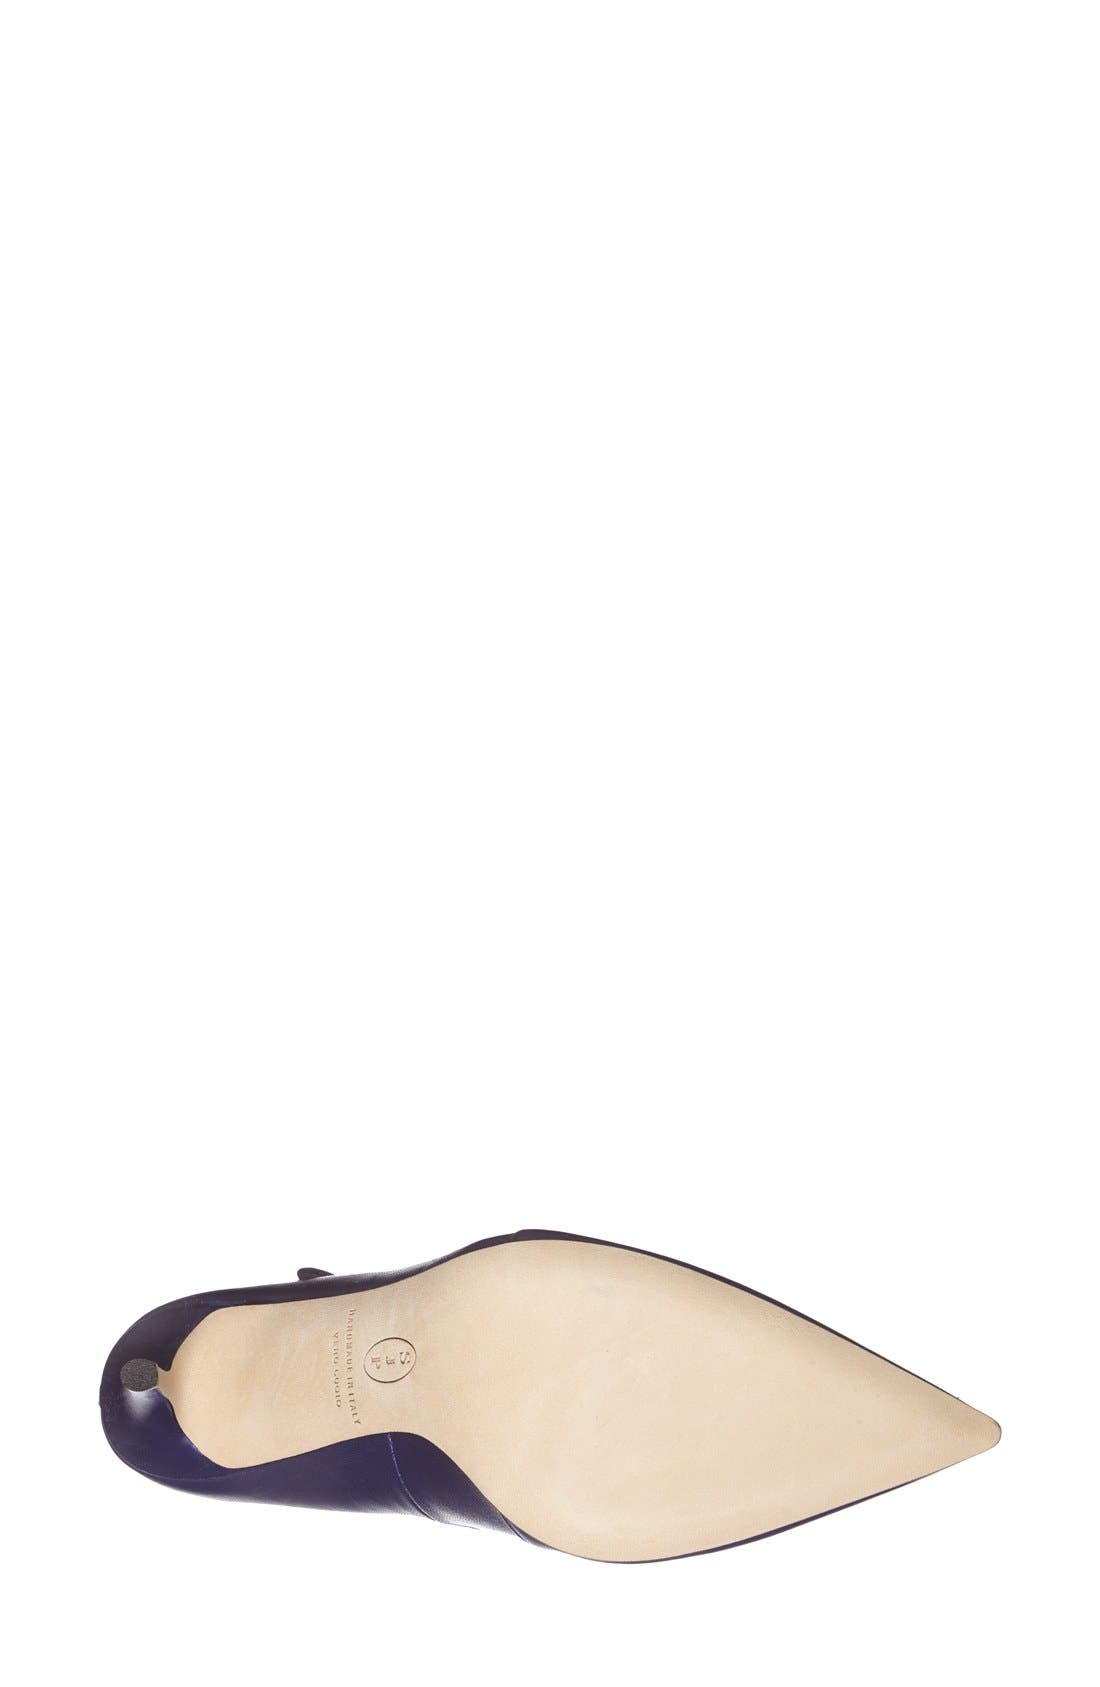 Alternate Image 3  - SJP 'Blythe' Leather T-Strap Mary Jane Pump (Women)